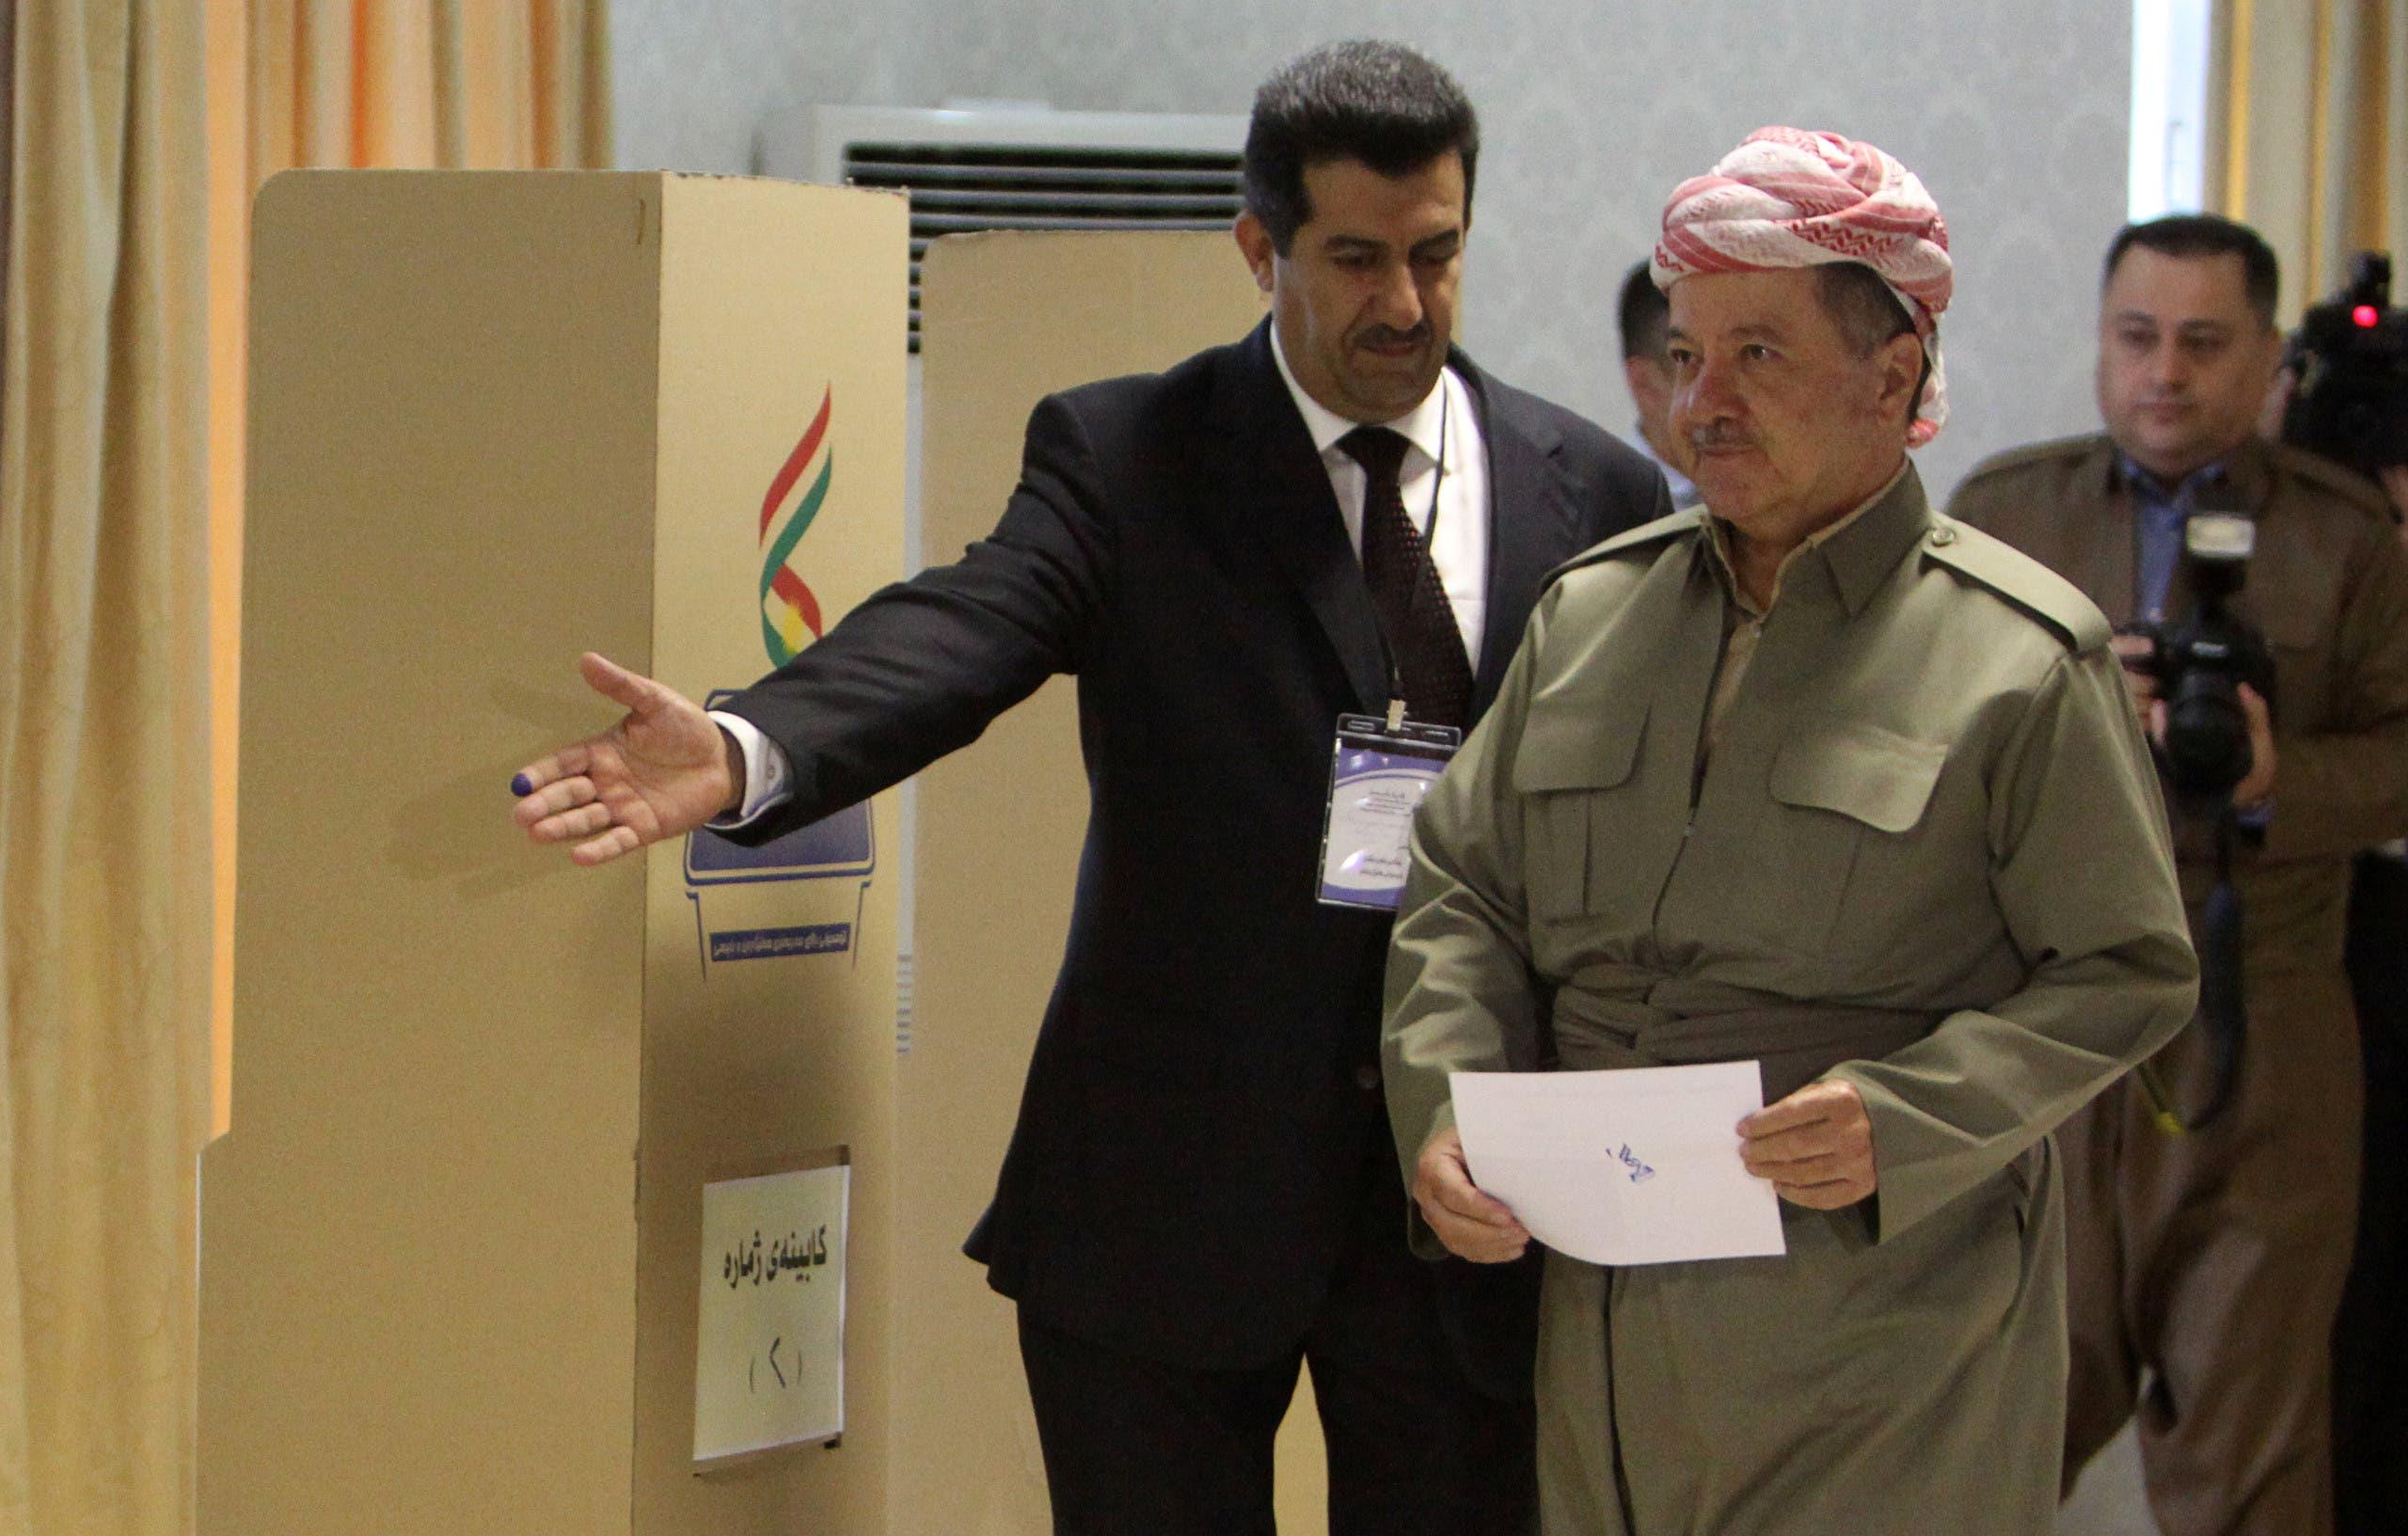 Iraqi Kurdish President Masoud Barzani casts his vote during Kurds independence referendum in Erbil, Iraq September 25, 2017. (Reuters)